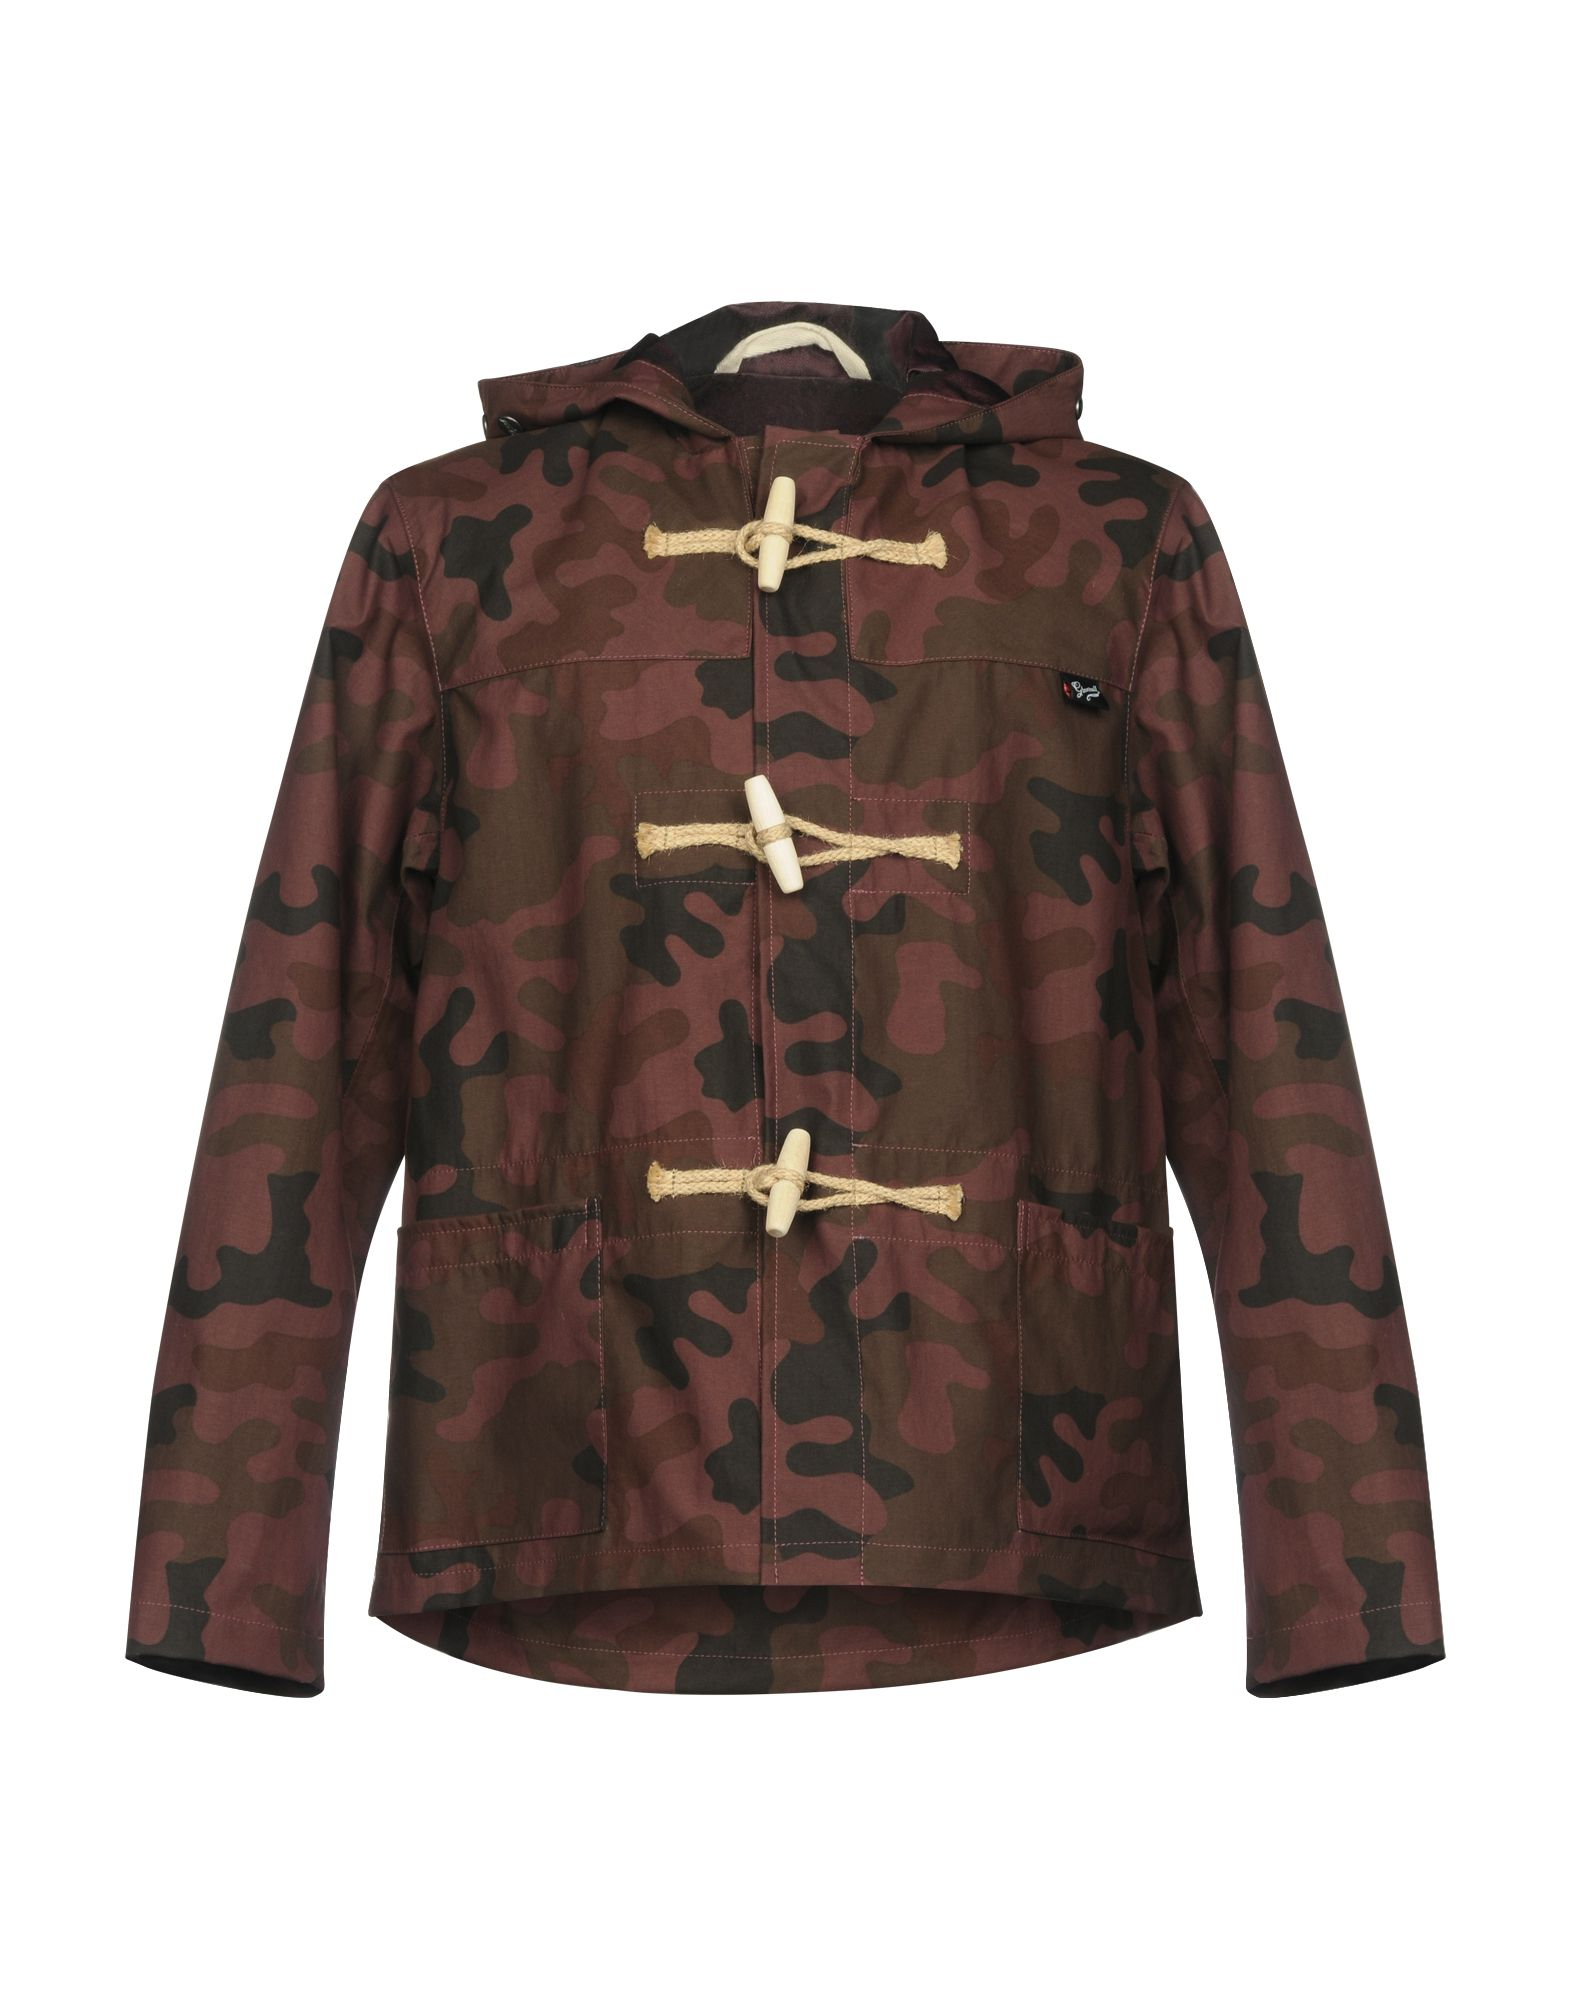 GLOVERALL Duffle Coat in Maroon